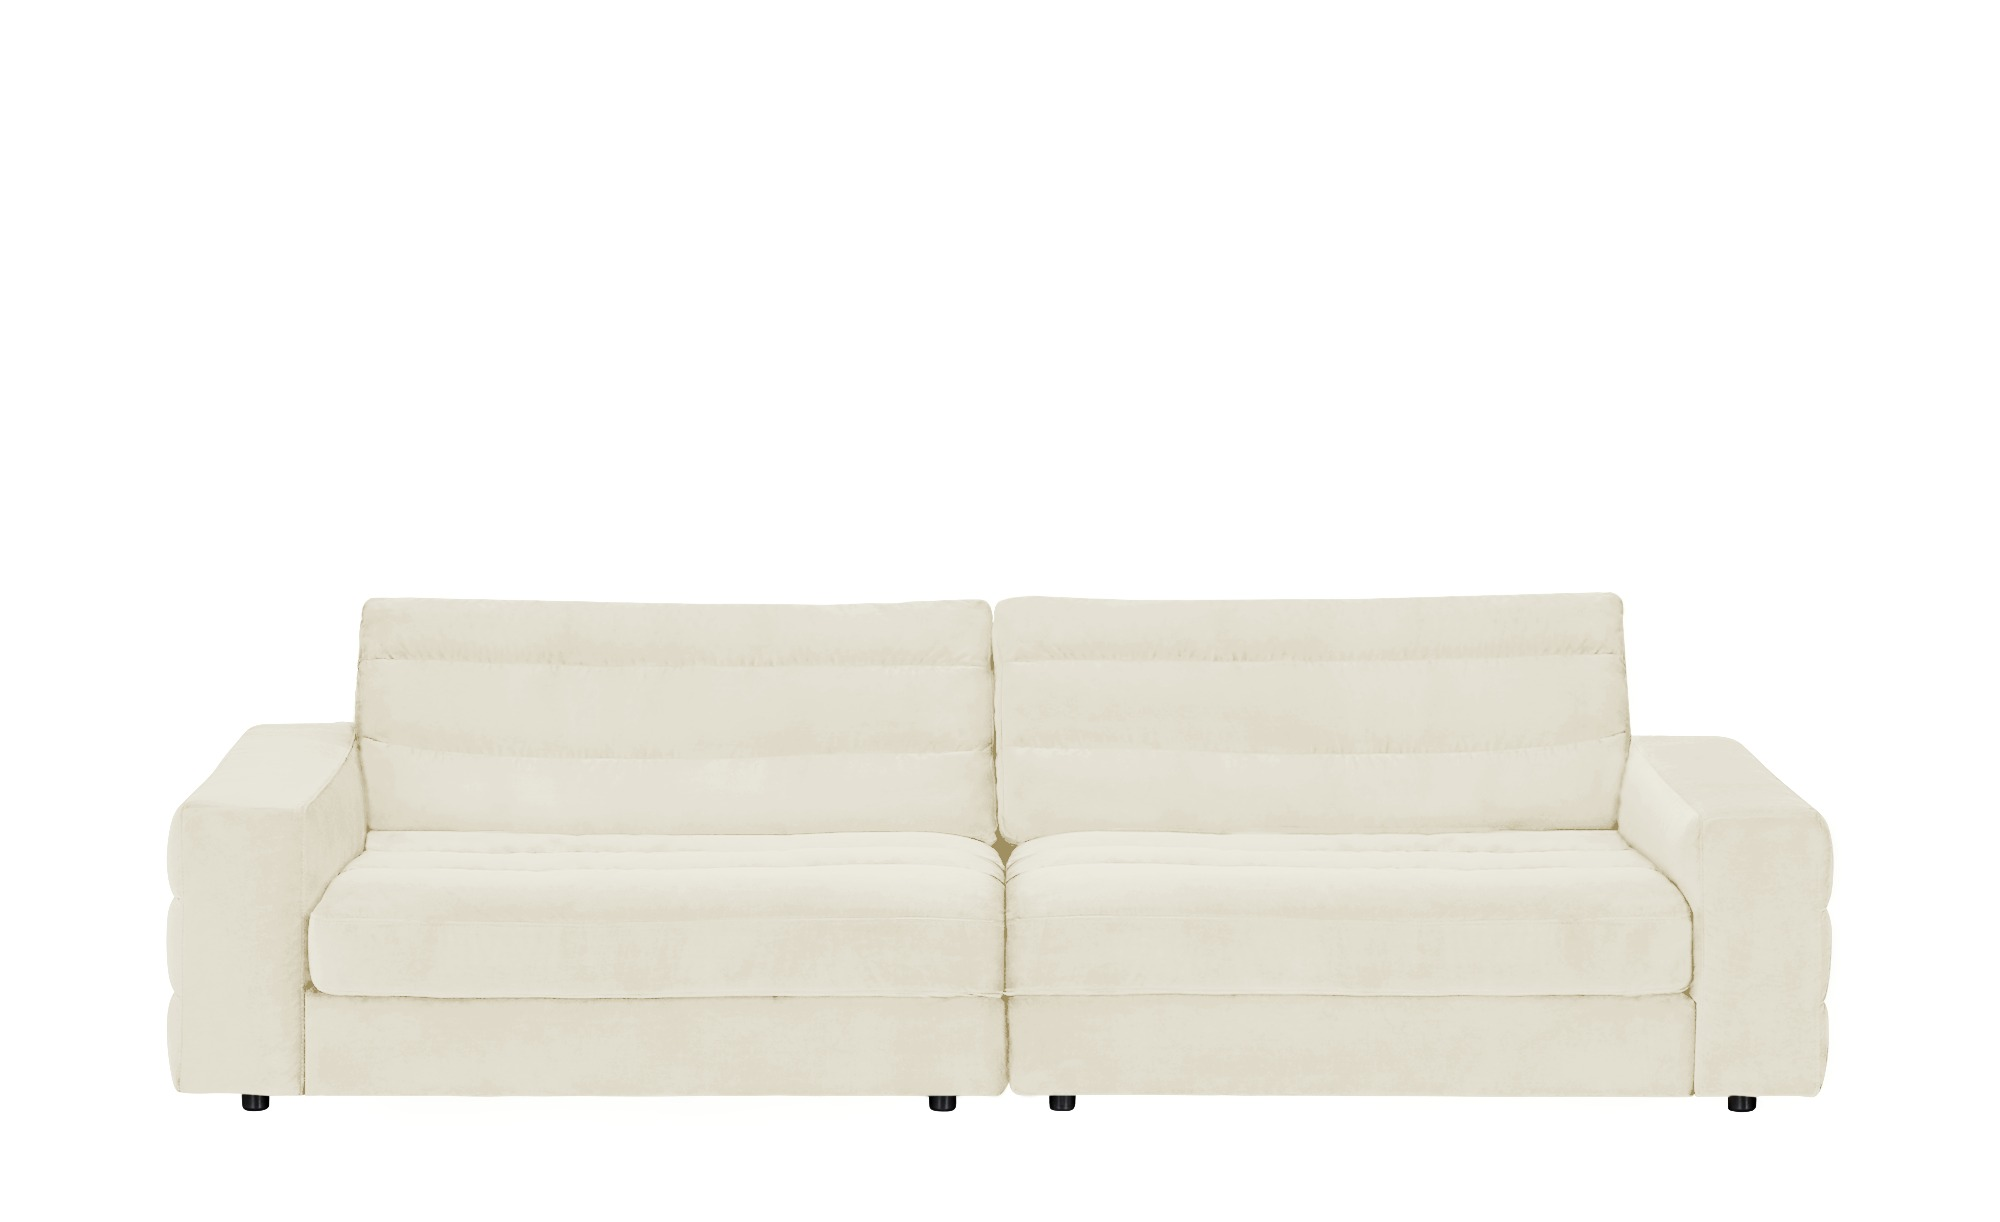 pop Big Sofa  Scarlatti ¦ creme ¦ Maße (cm): B: 296 H: 83 T: 125 Polstermöbel > Sofas > Big-Sofas - Höffner